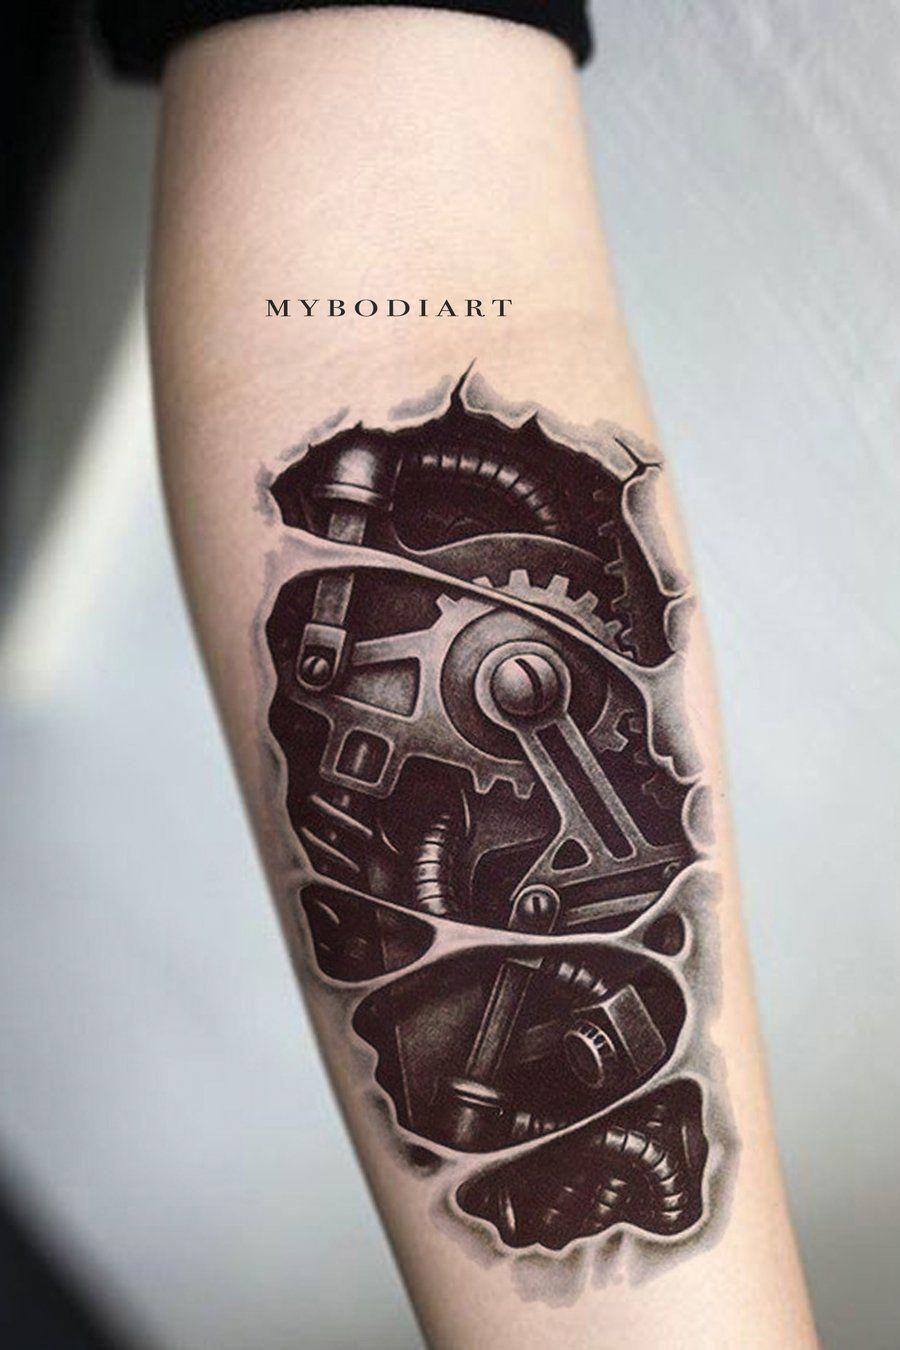 Cyb bionic robot temporary tattoo tattoos full sleeve